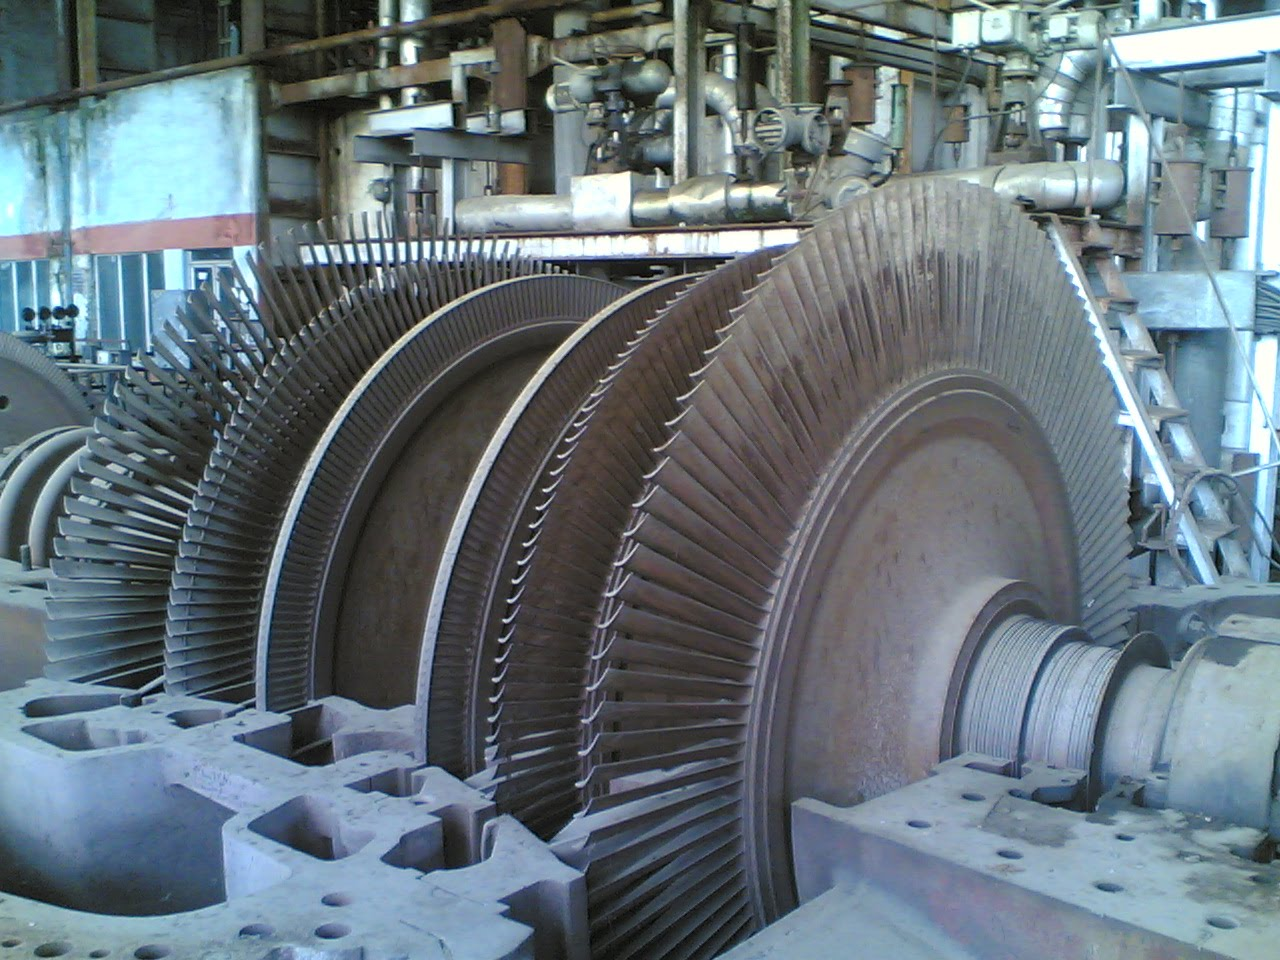 Mw Gas Turbine - Mw Gas Turbine Suppliers, Buyers, Wholesalers and